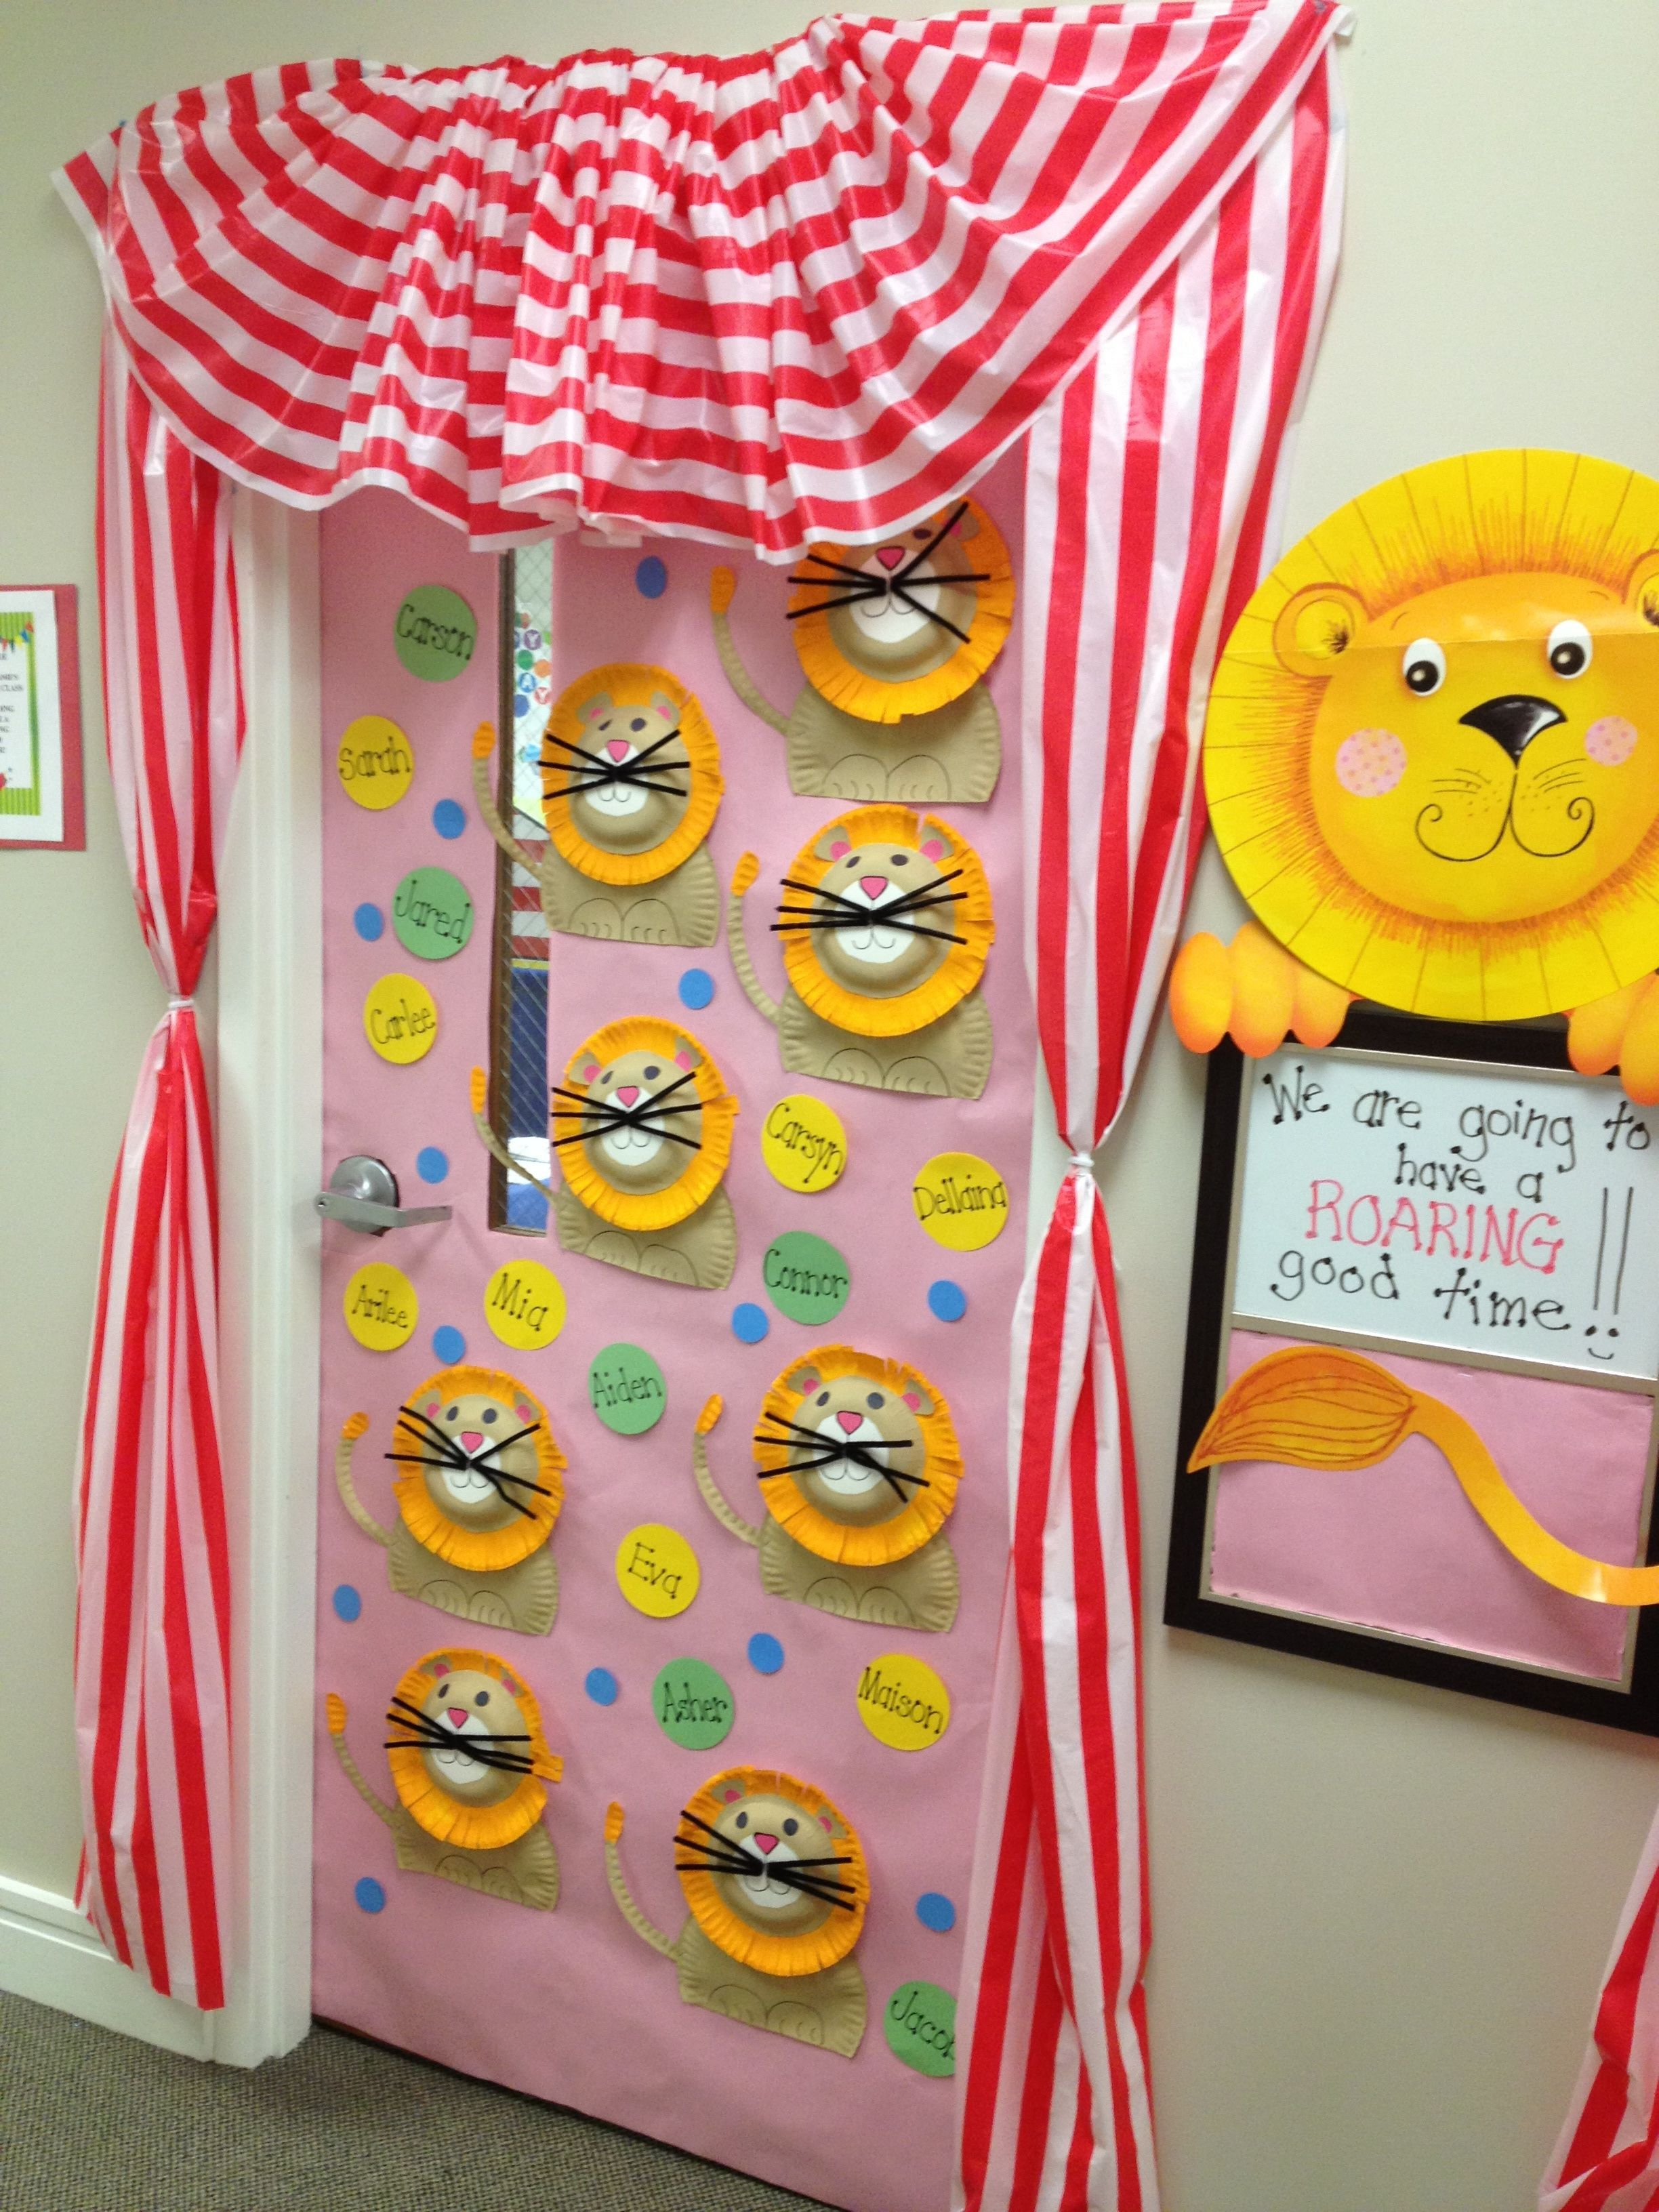 Back to school carnival theme at Temple Preschool New Bern, NC